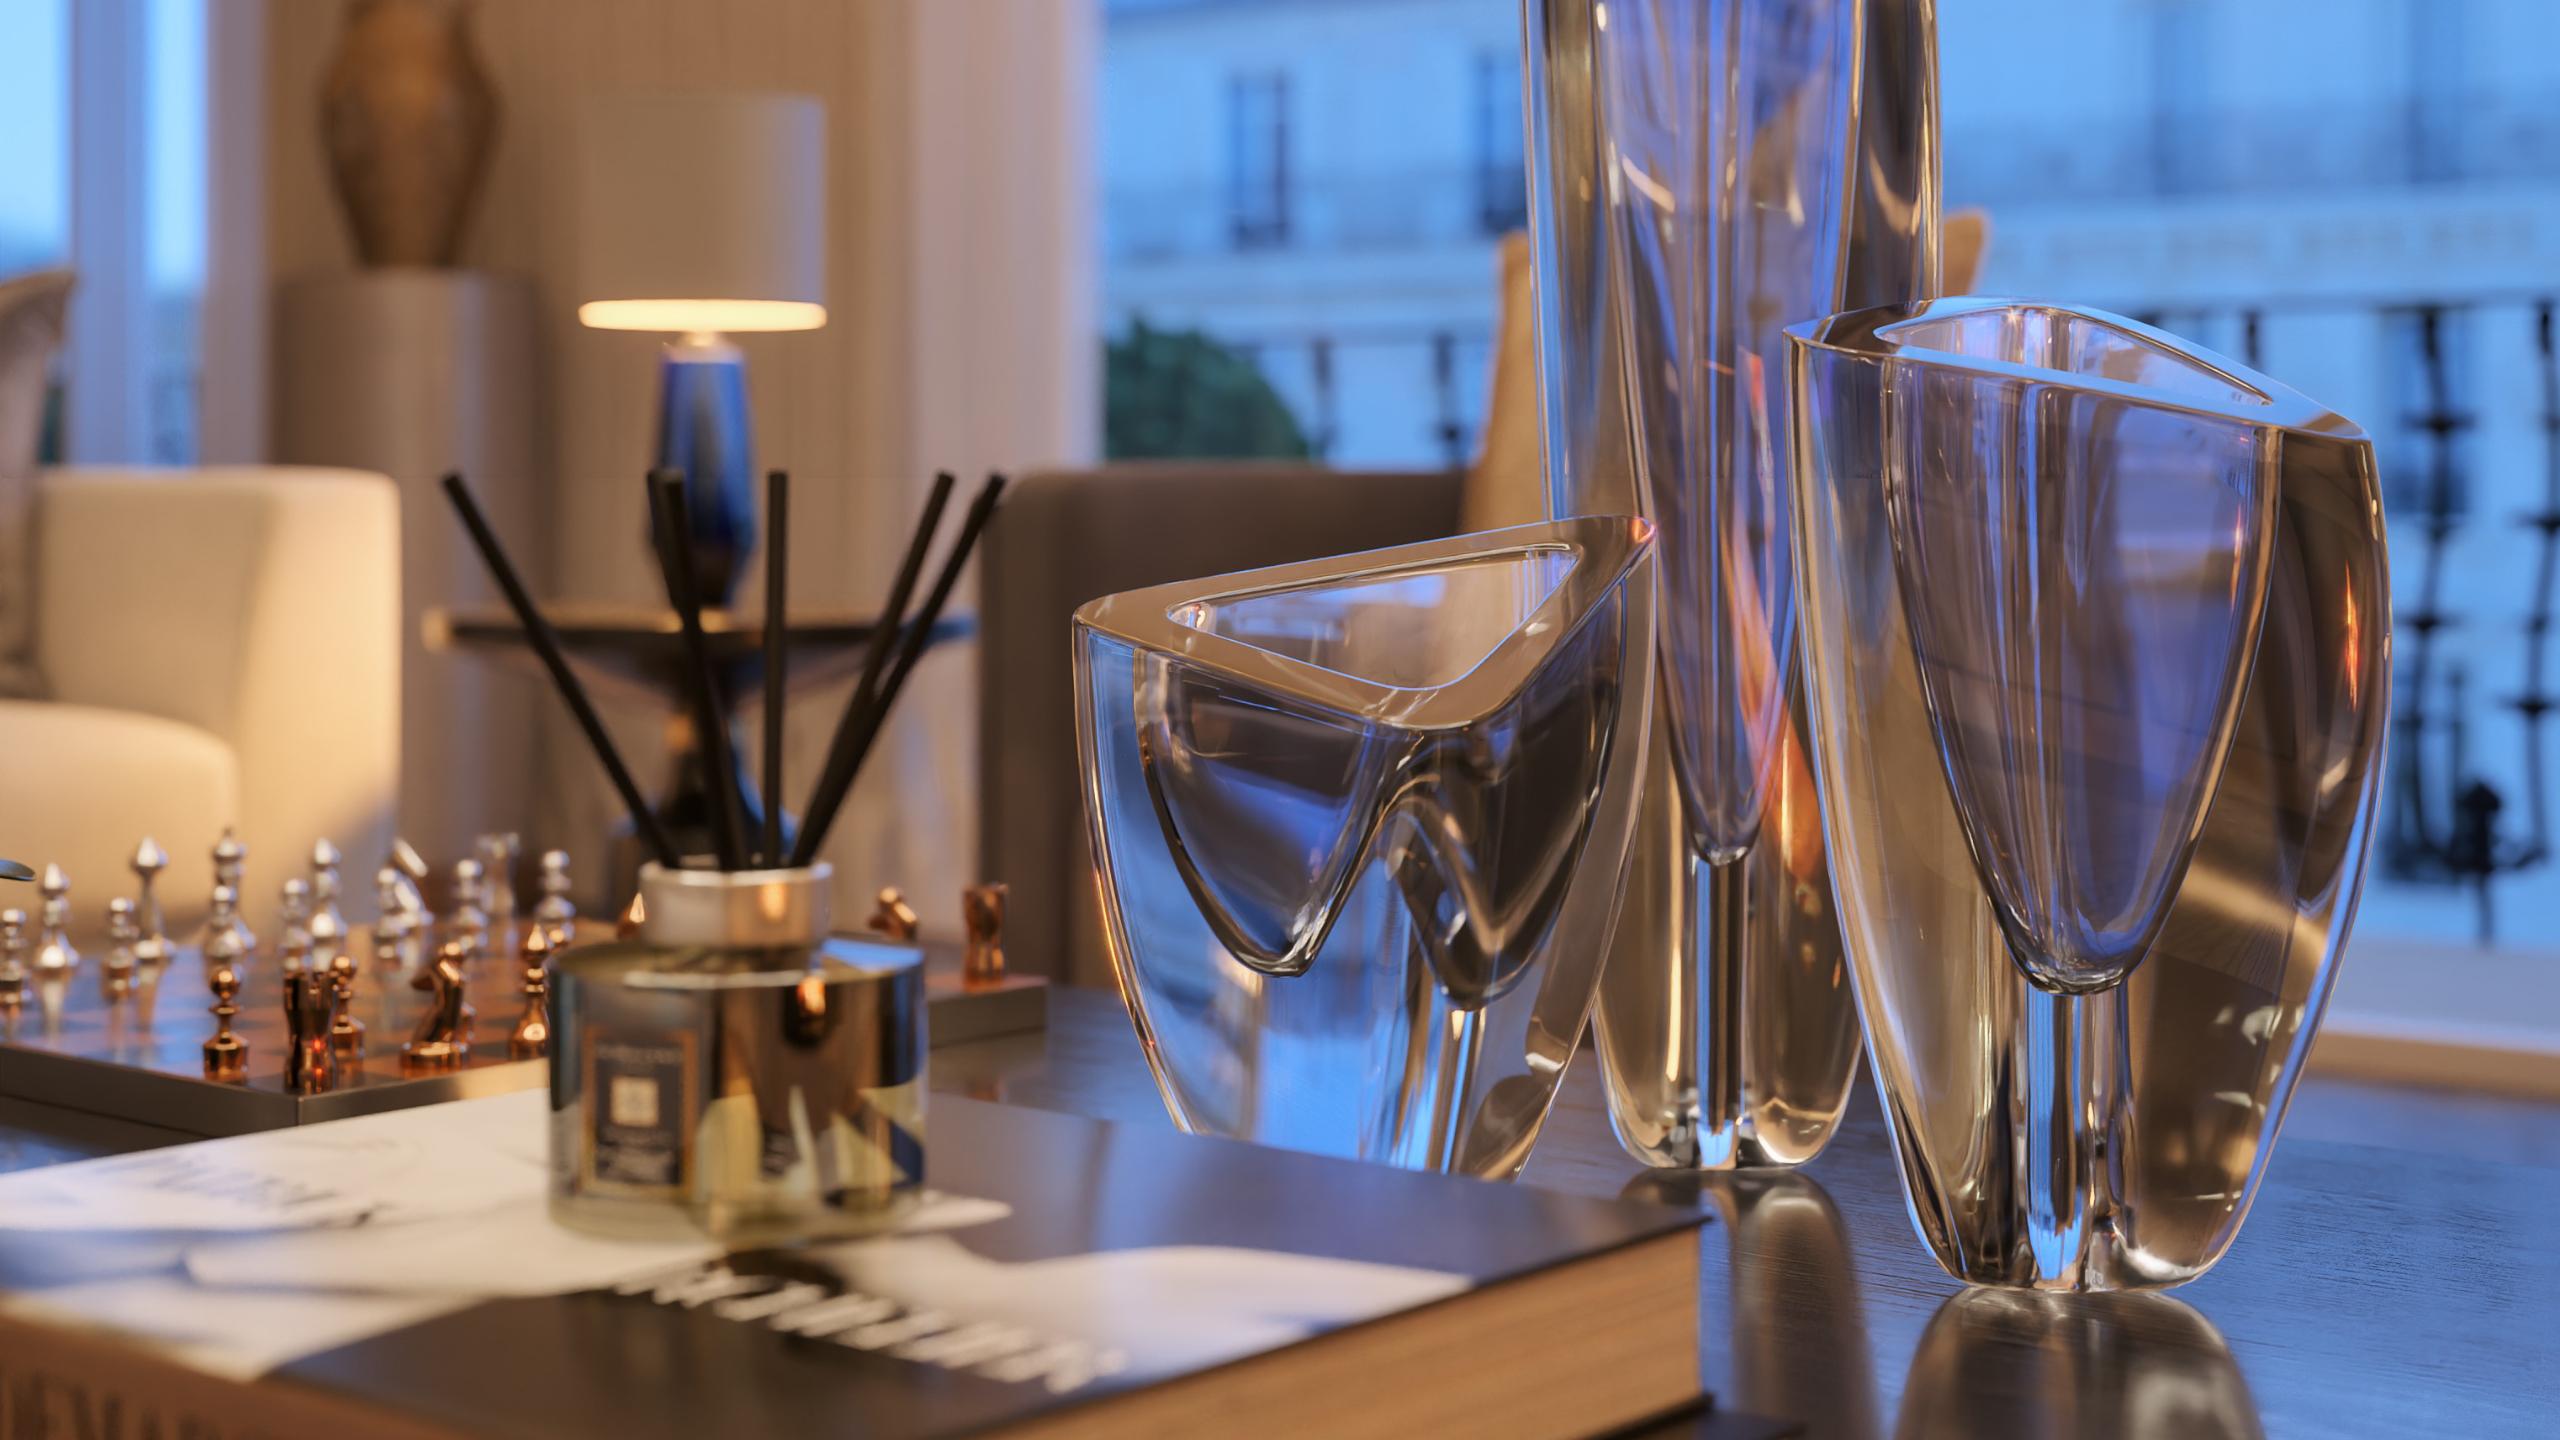 Close up of glassware for an interior design shoot